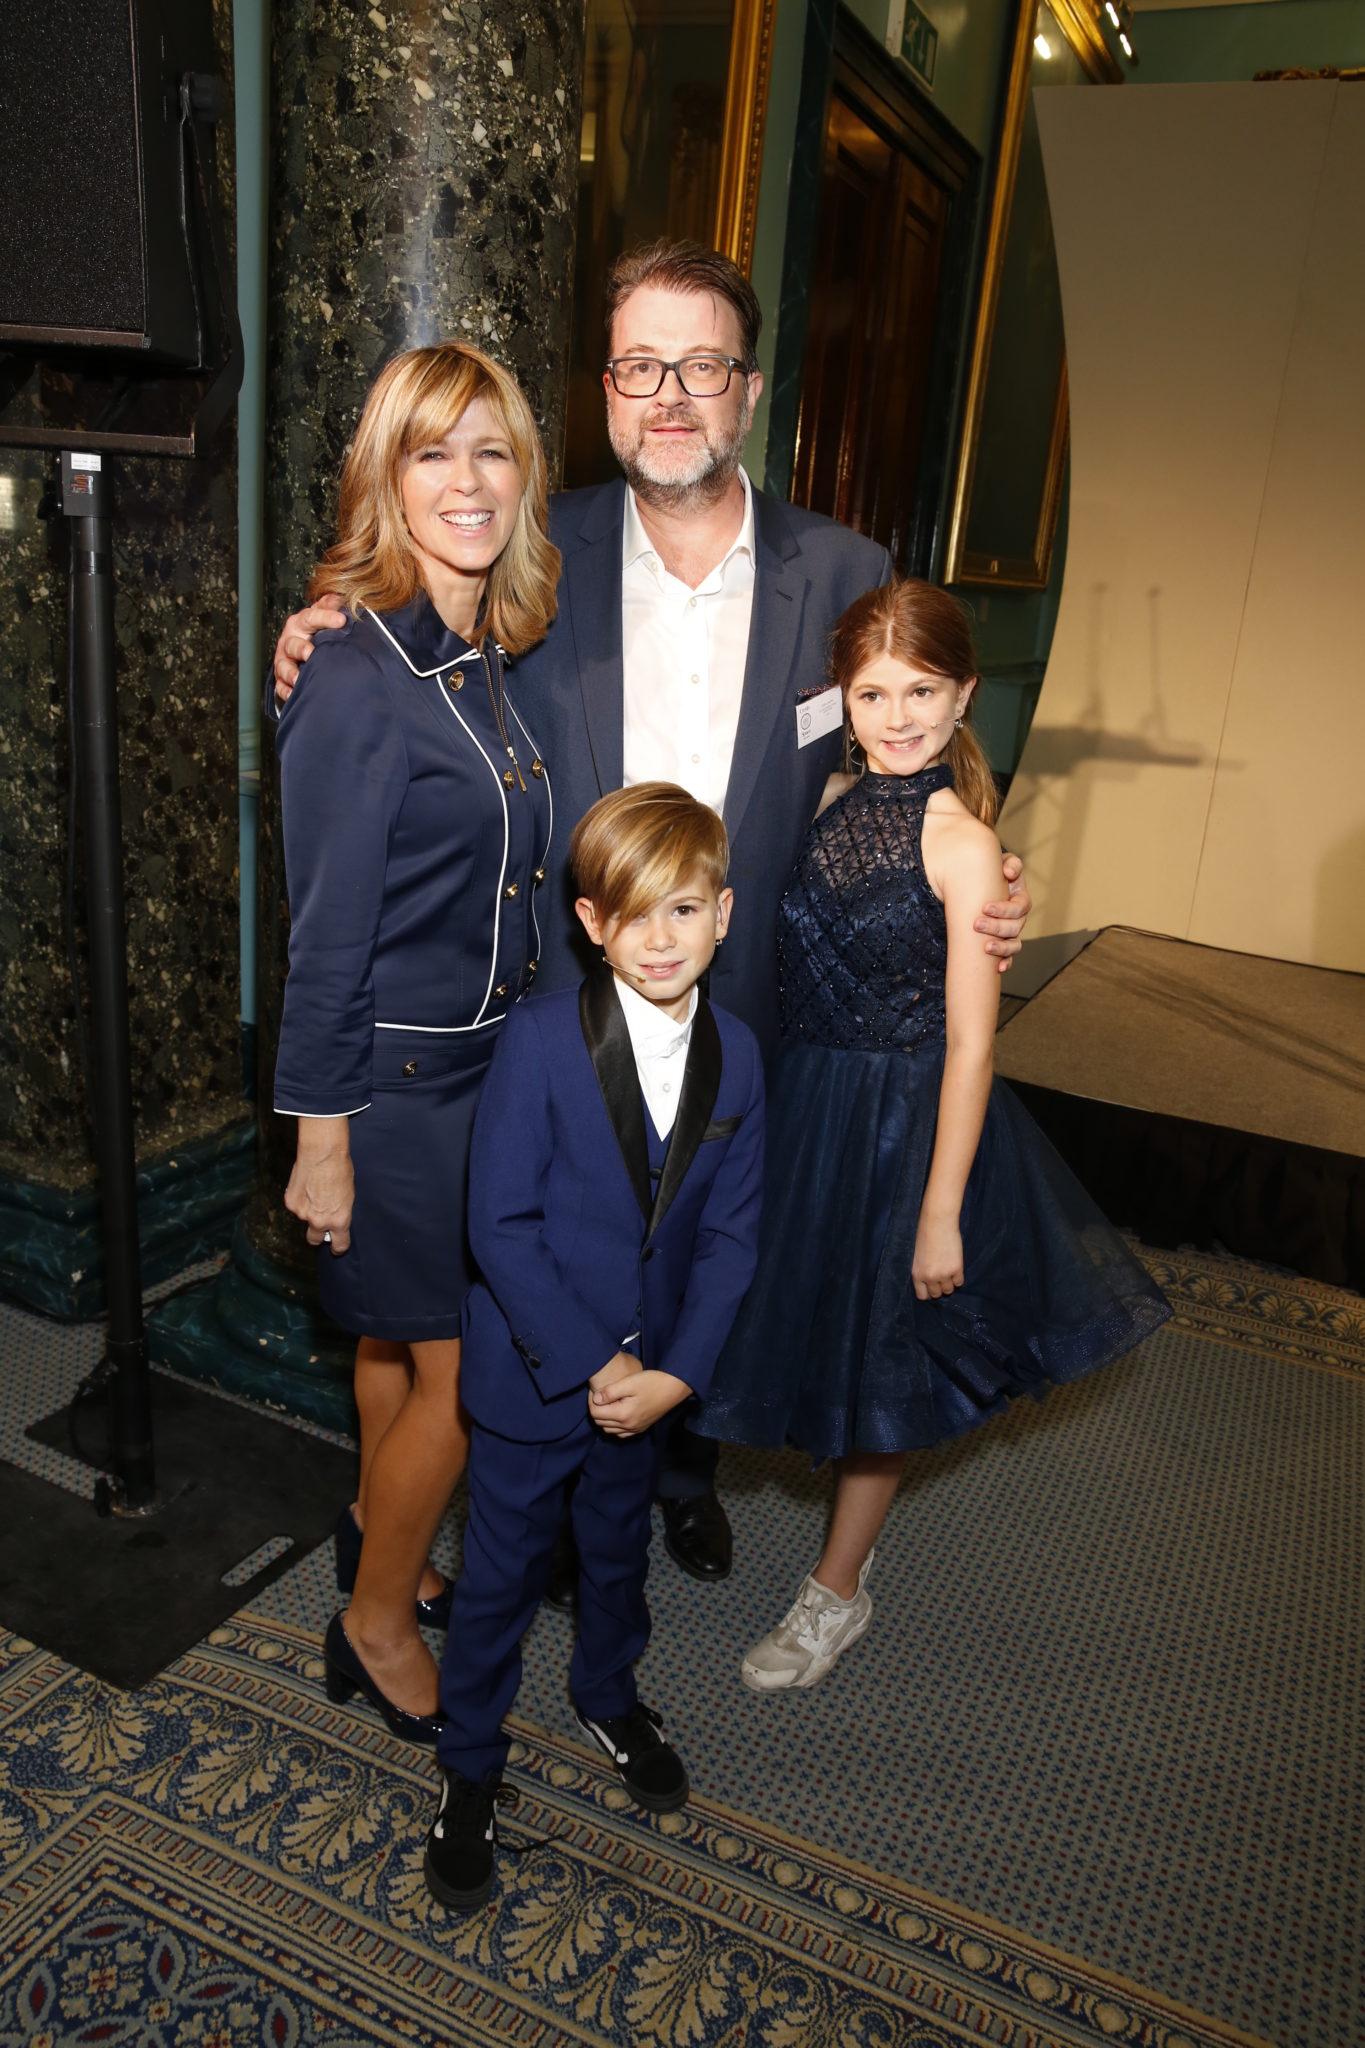 Kate Garraway Shares Update On Husband Derek Draper S Condition In Icu With Coronavirus Spin1038